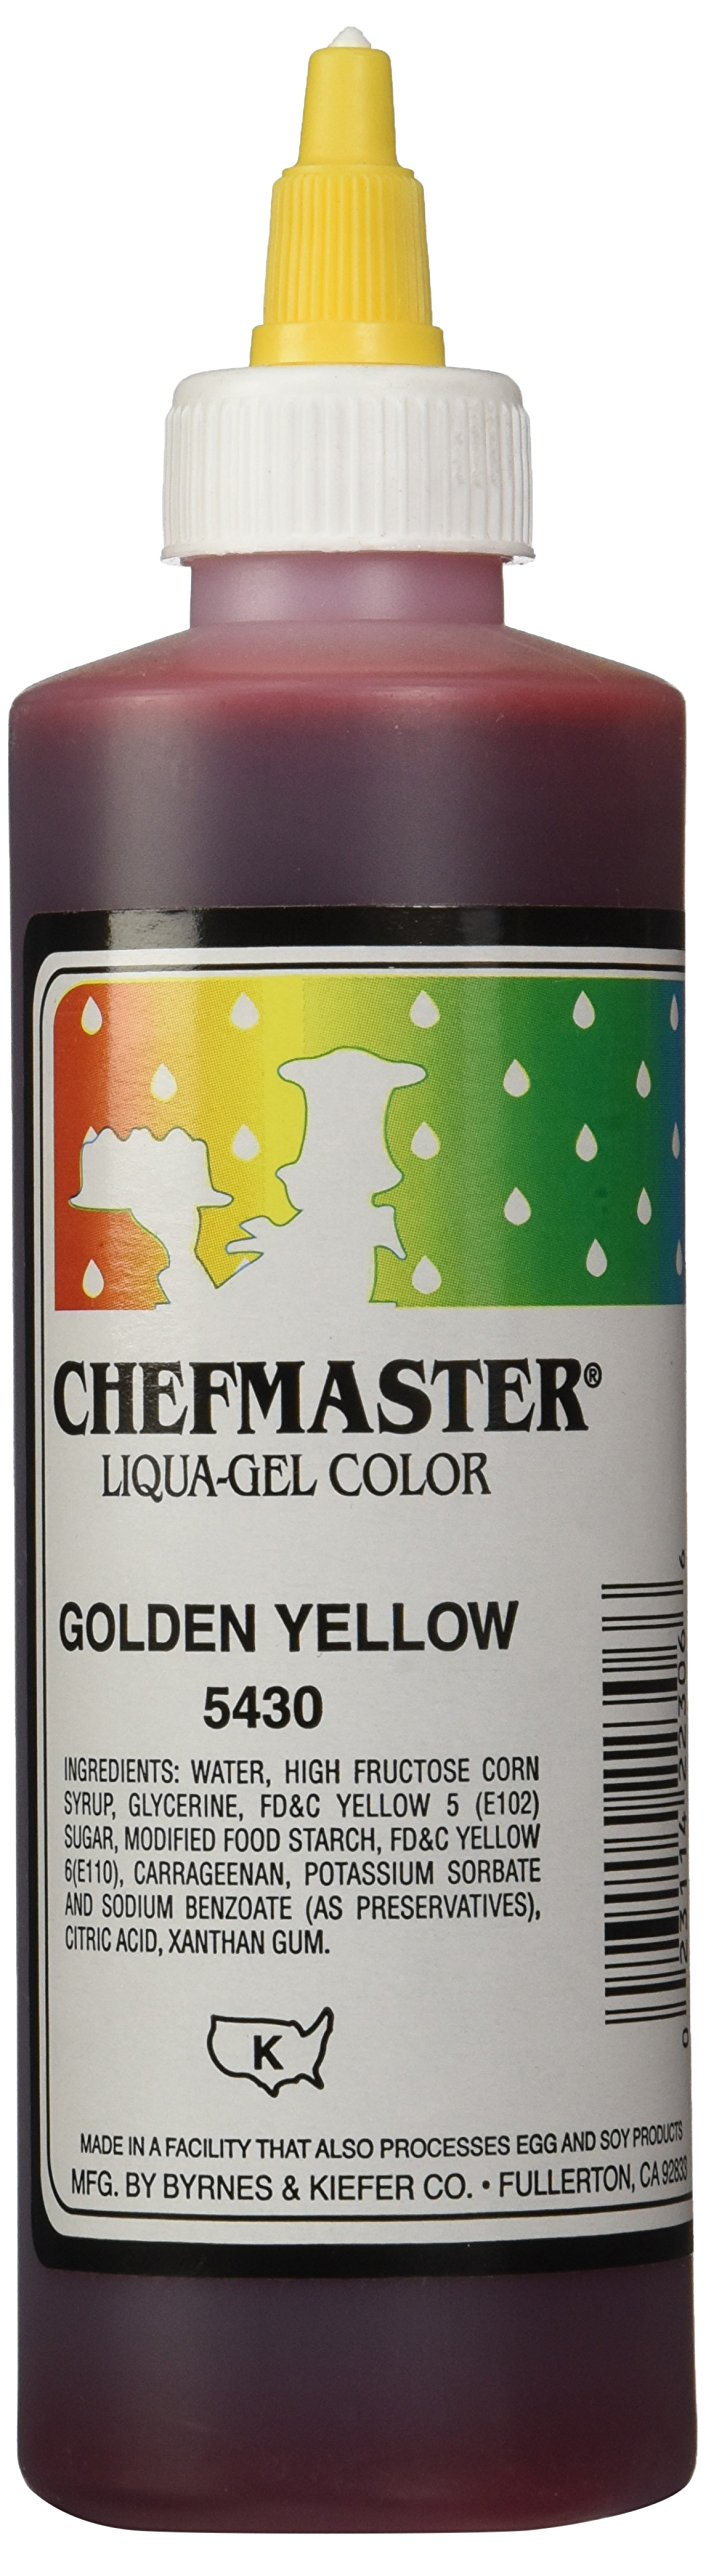 Chefmaster Liqua-Gel Food Color, 10.5-Ounce, Golden Yellow by Chefmaster